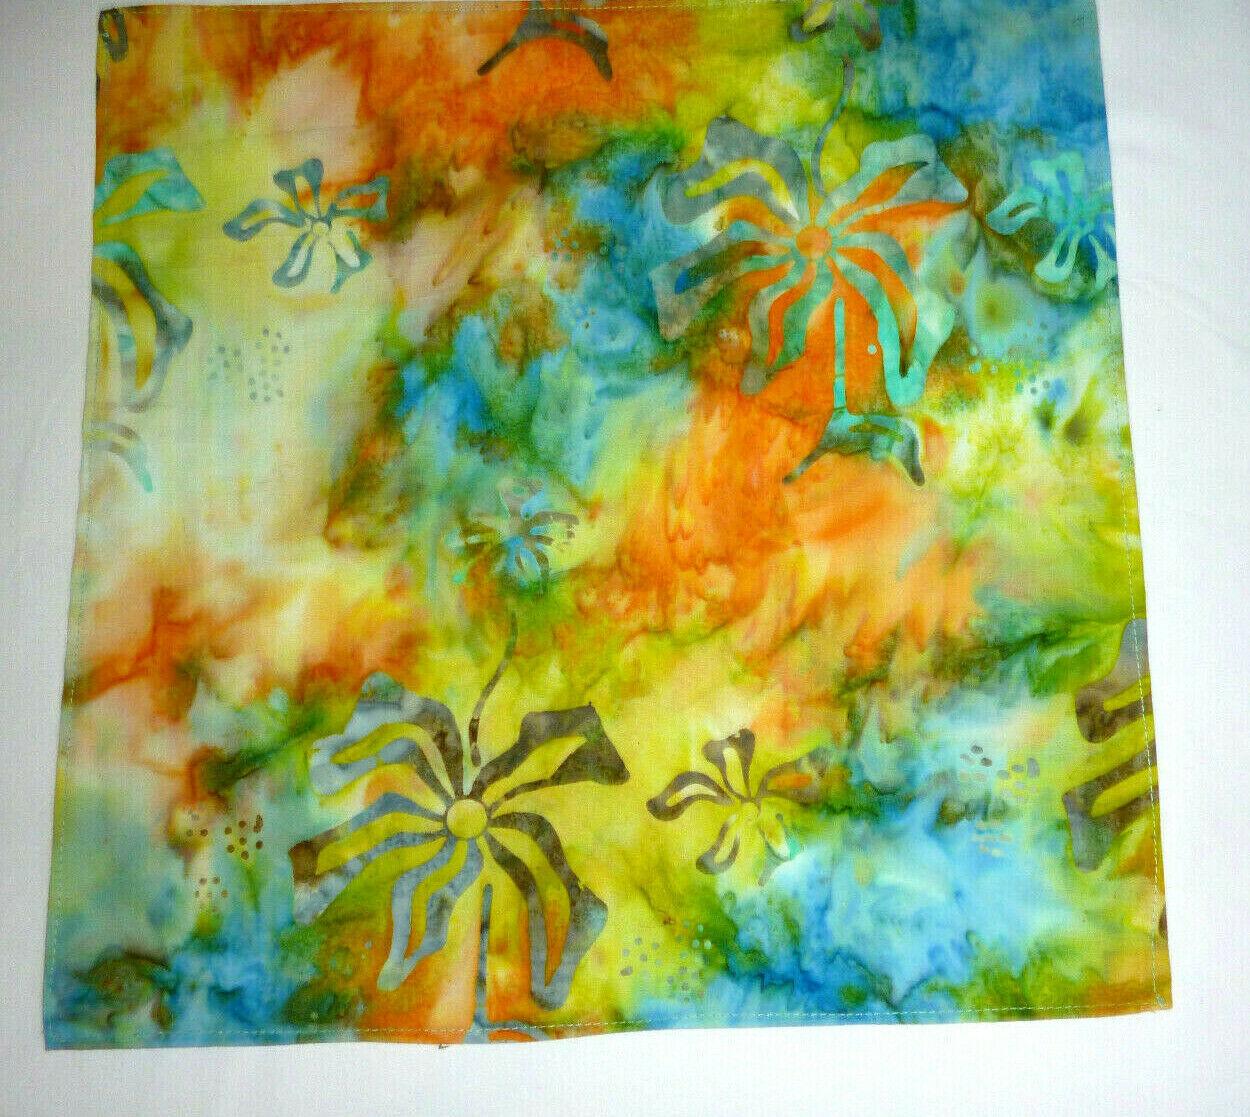 Pure cotton mens top pocket handkerchief Blue/orange/yellow abstract pattern NEW